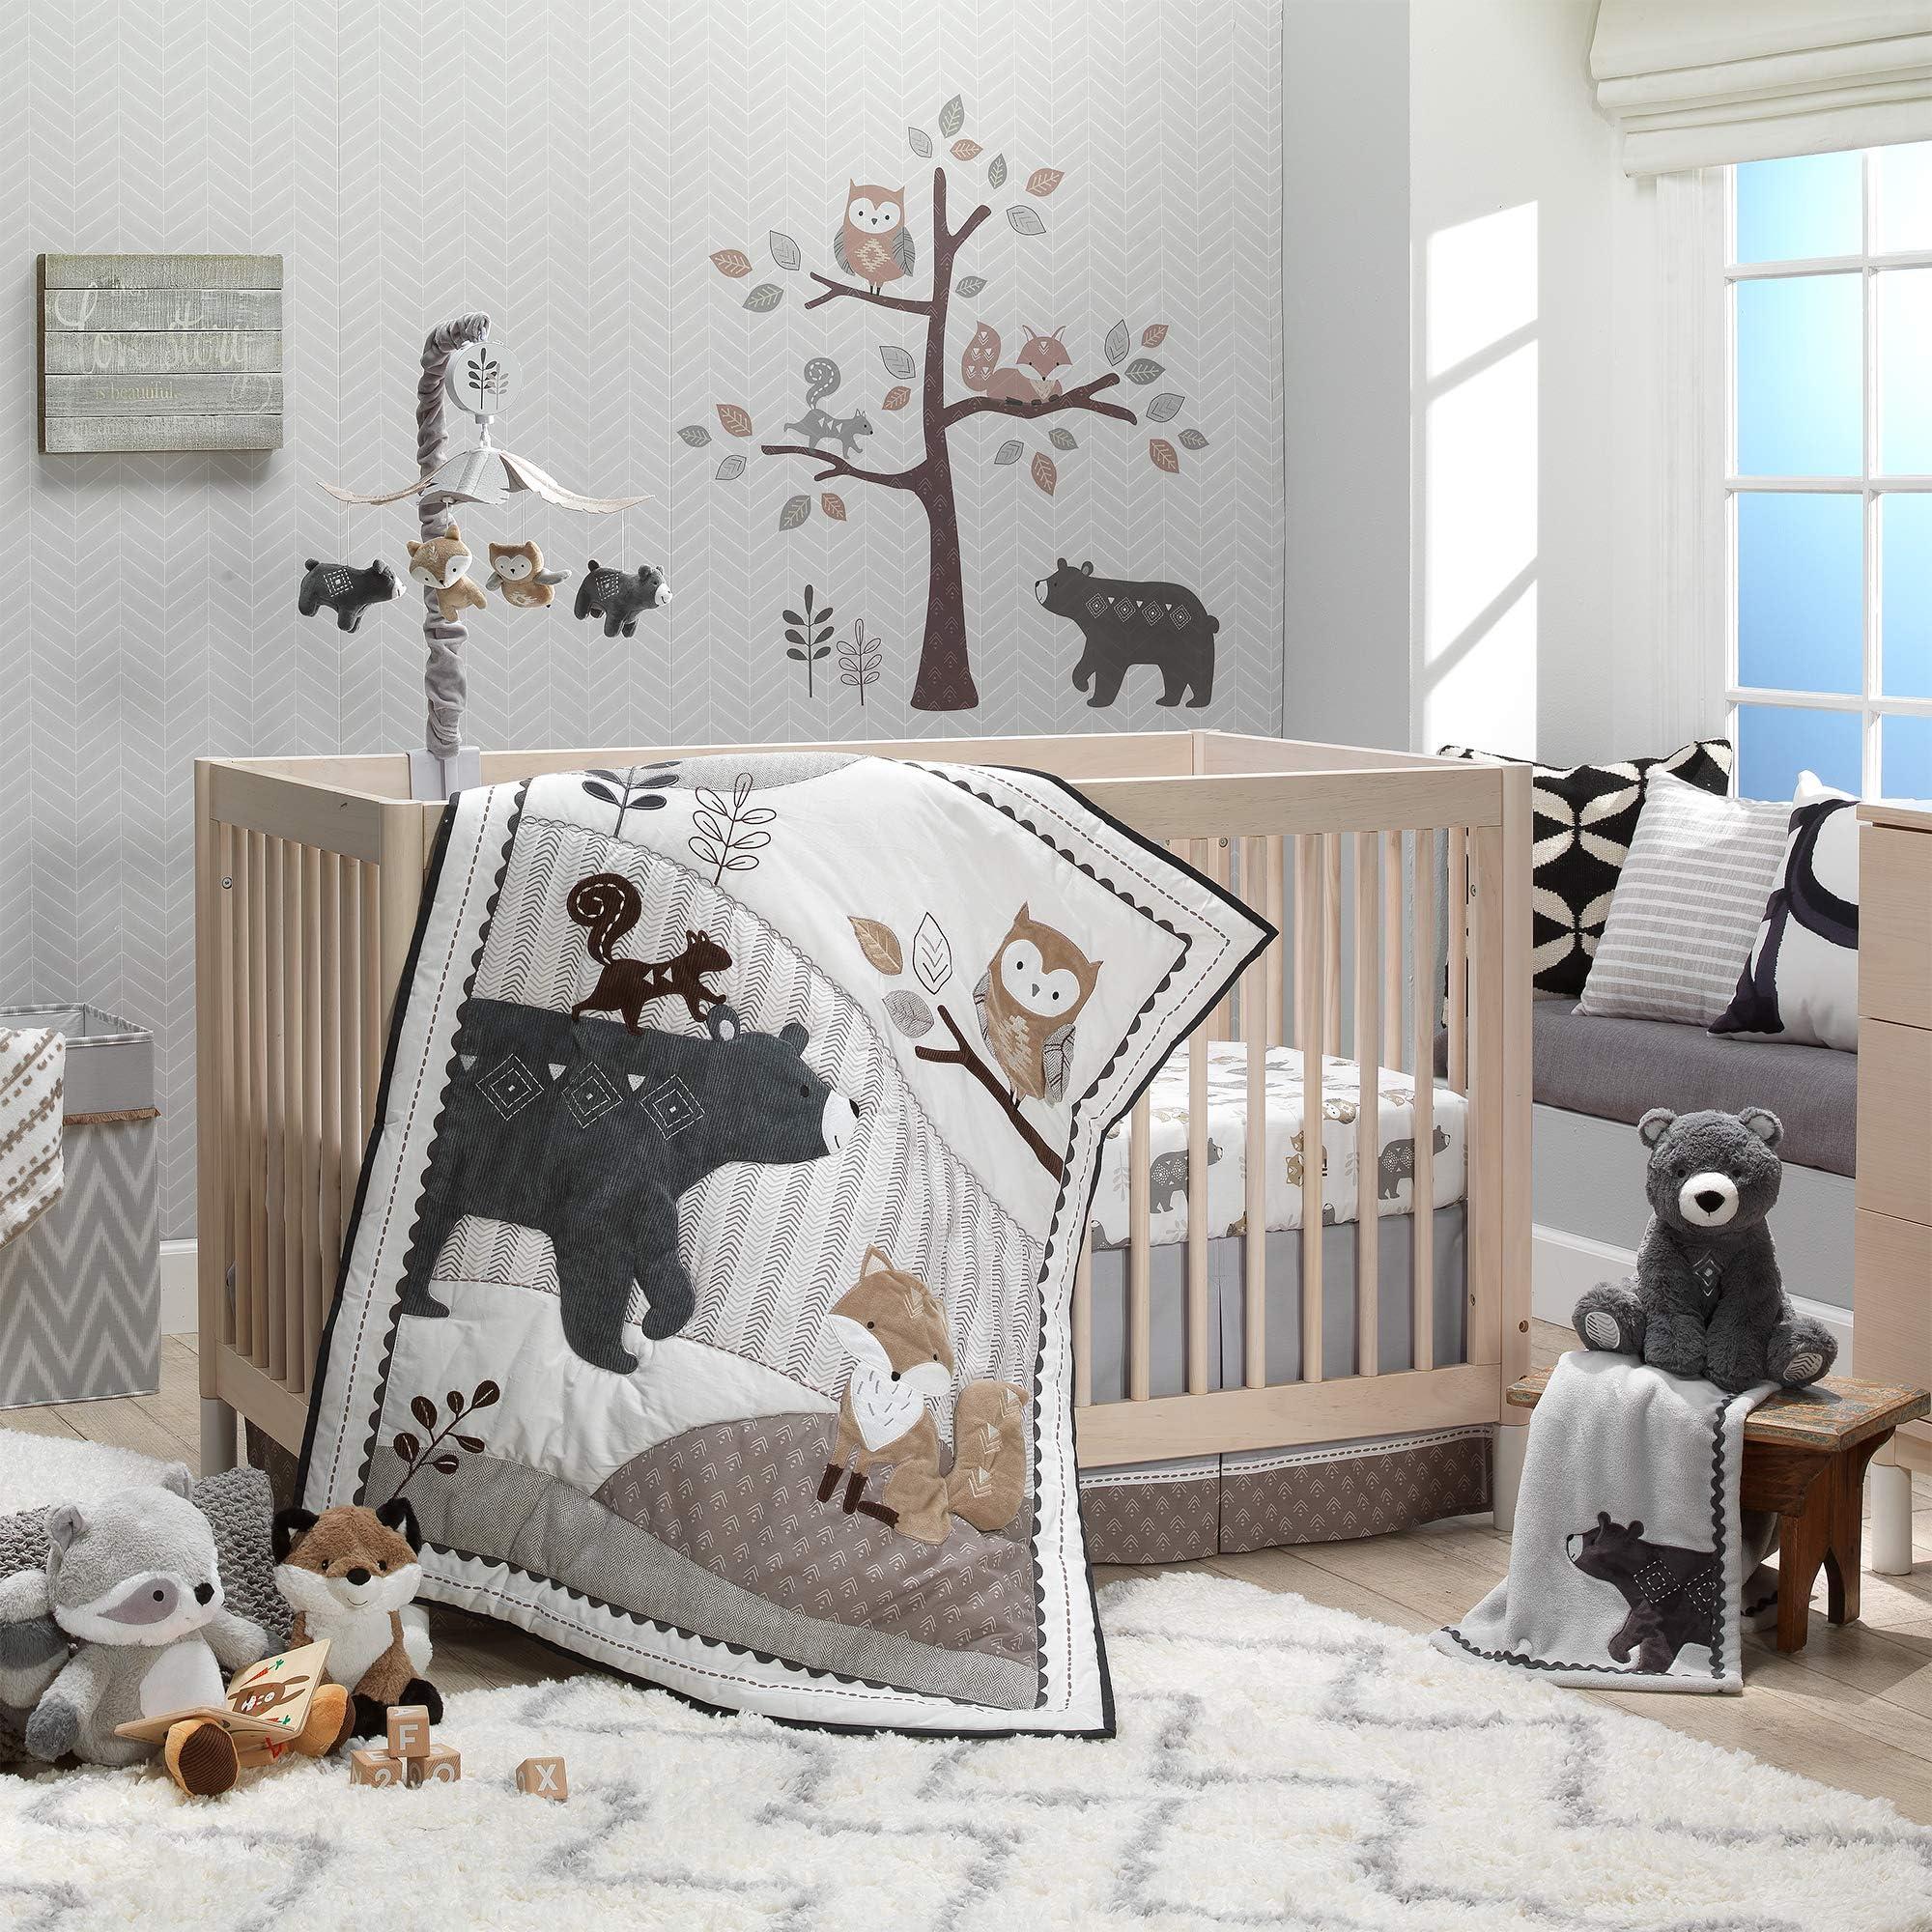 Deer woodland themed shower fawn 5 Piece Baby Girl Gift Set Nursery Burp Cloths Baby Bedding Washcloths